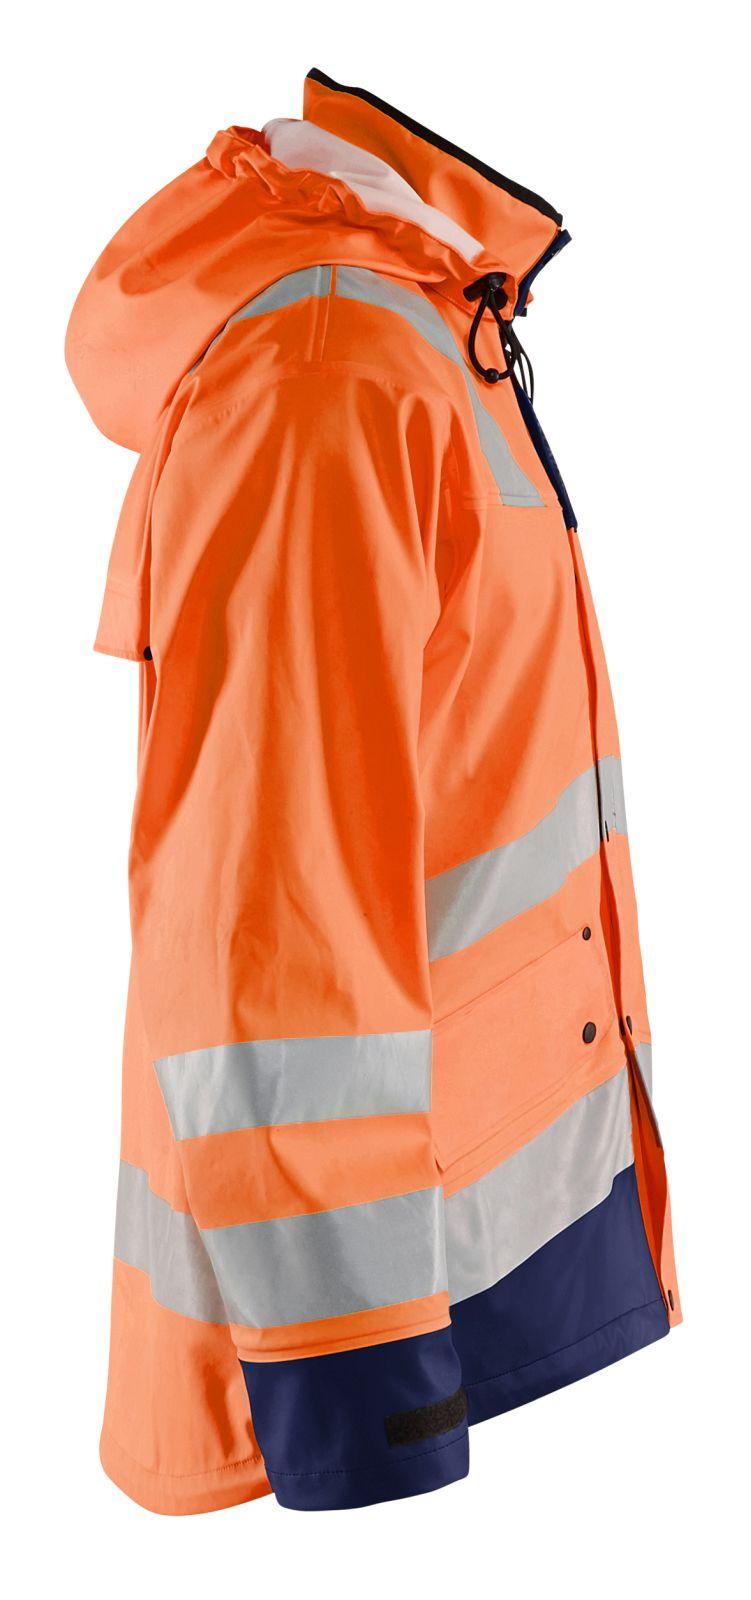 Blaklader Regenjacks 43022003 High Vis oranje-marineblauw(5389)